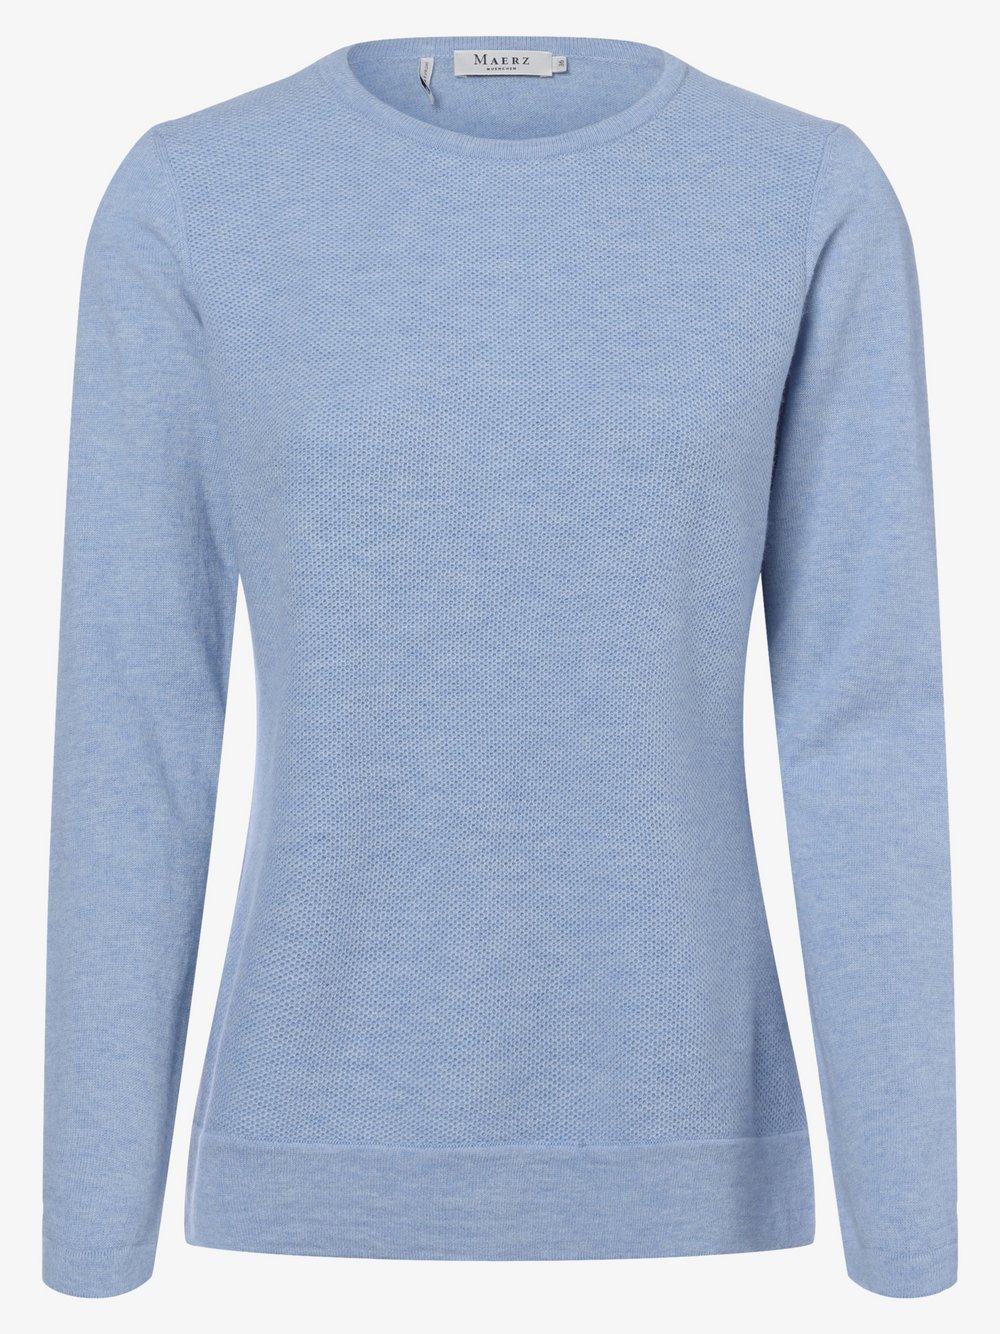 März - Sweter damski, niebieski